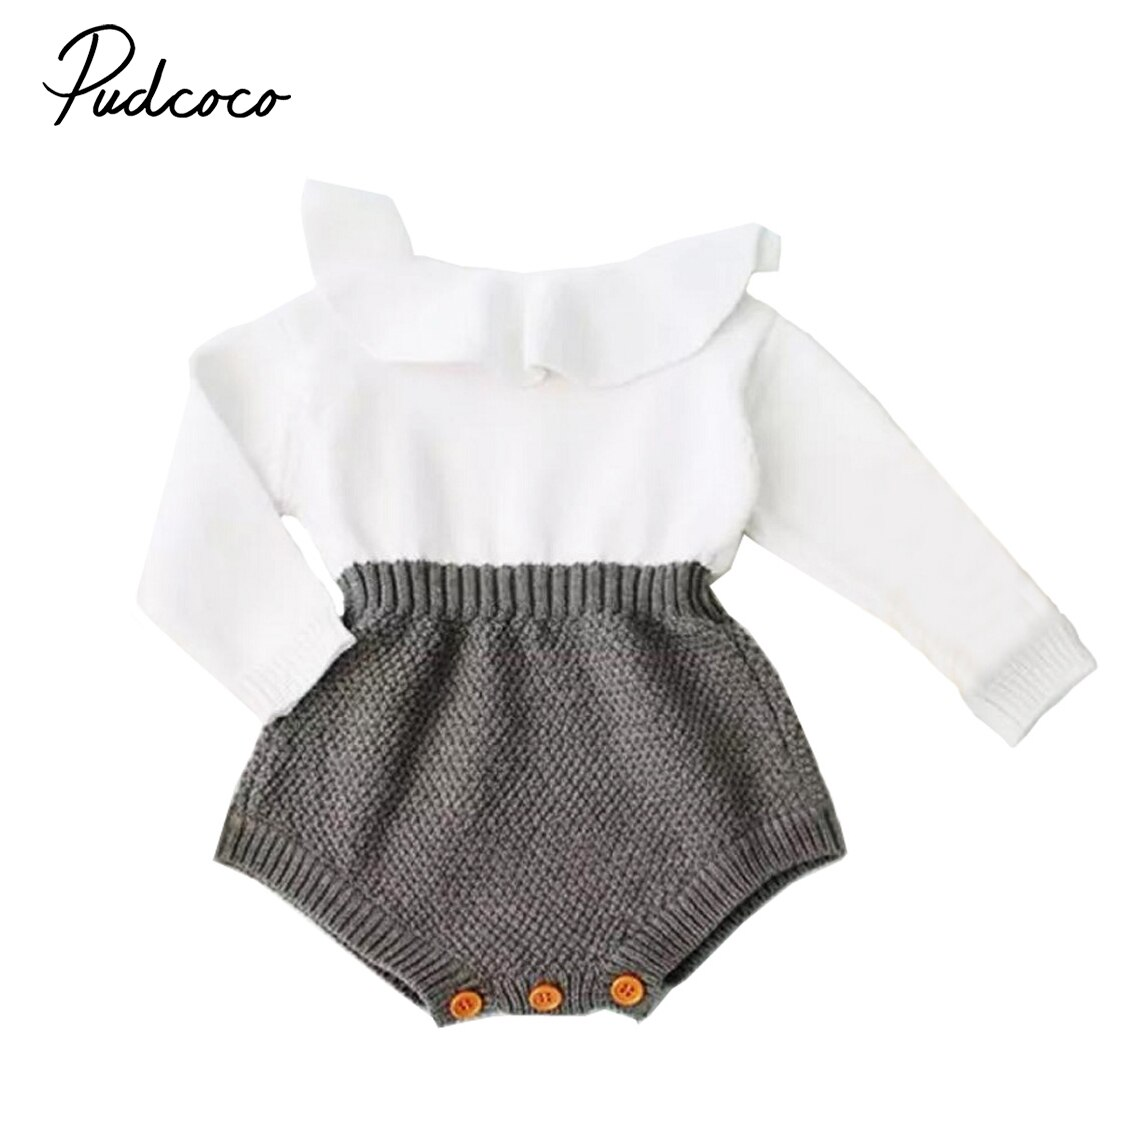 Pudcoco bebé recién nacido niña mezcla de lana bebé mono suéter de punto caliente manga larga mamelucos otoño